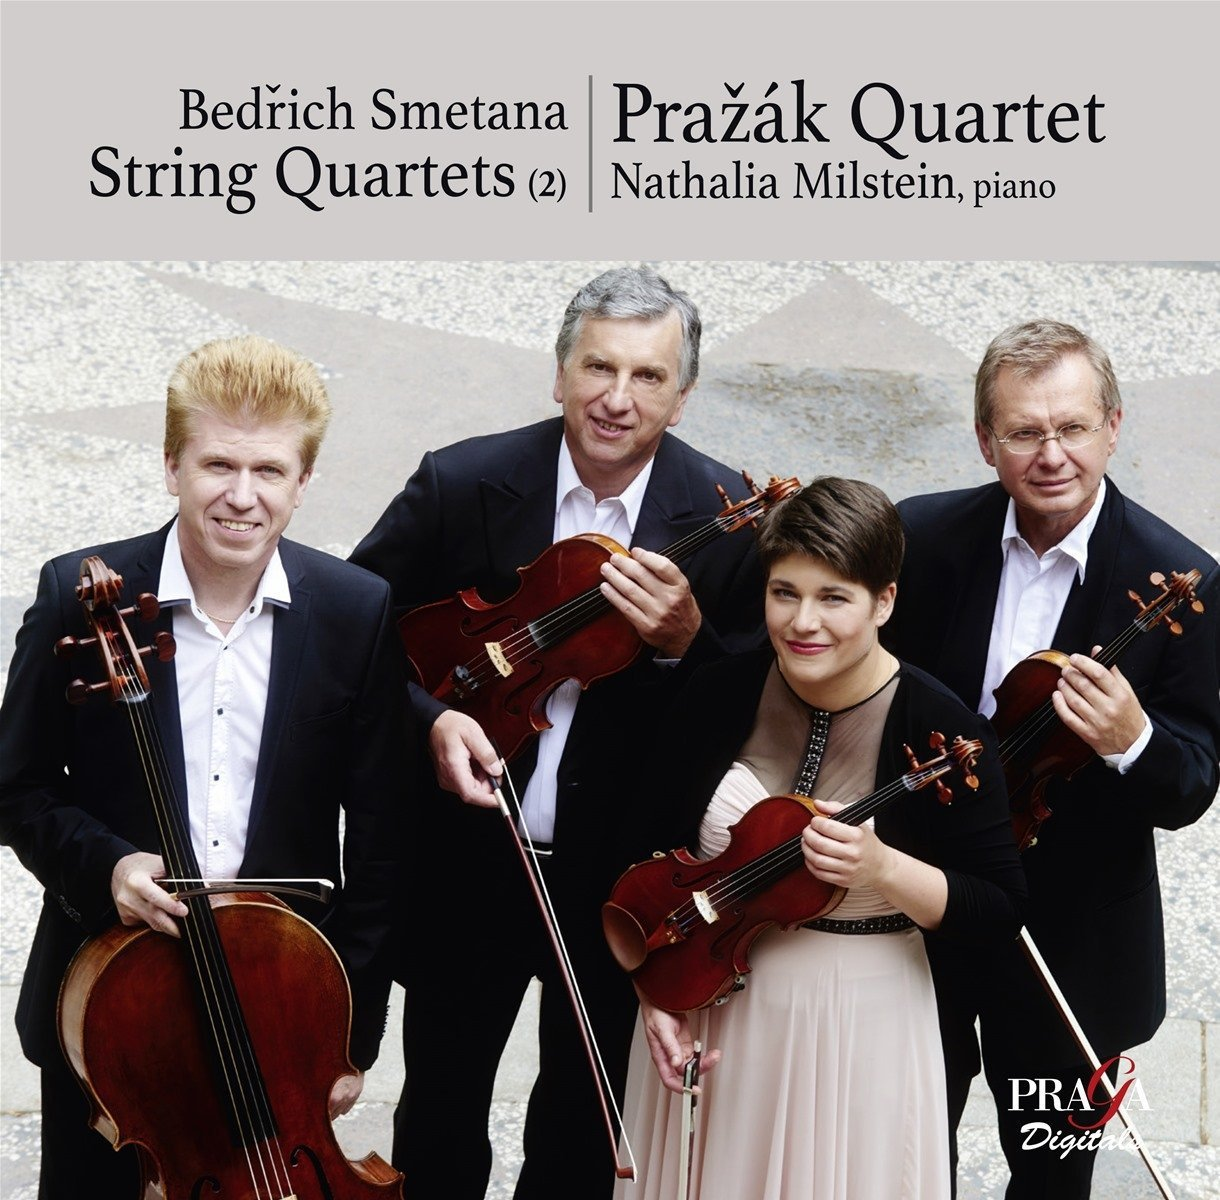 лучшая цена Prazak Quartet Natalia Milstein. String Quartet No.1 String Quartet (SACD)